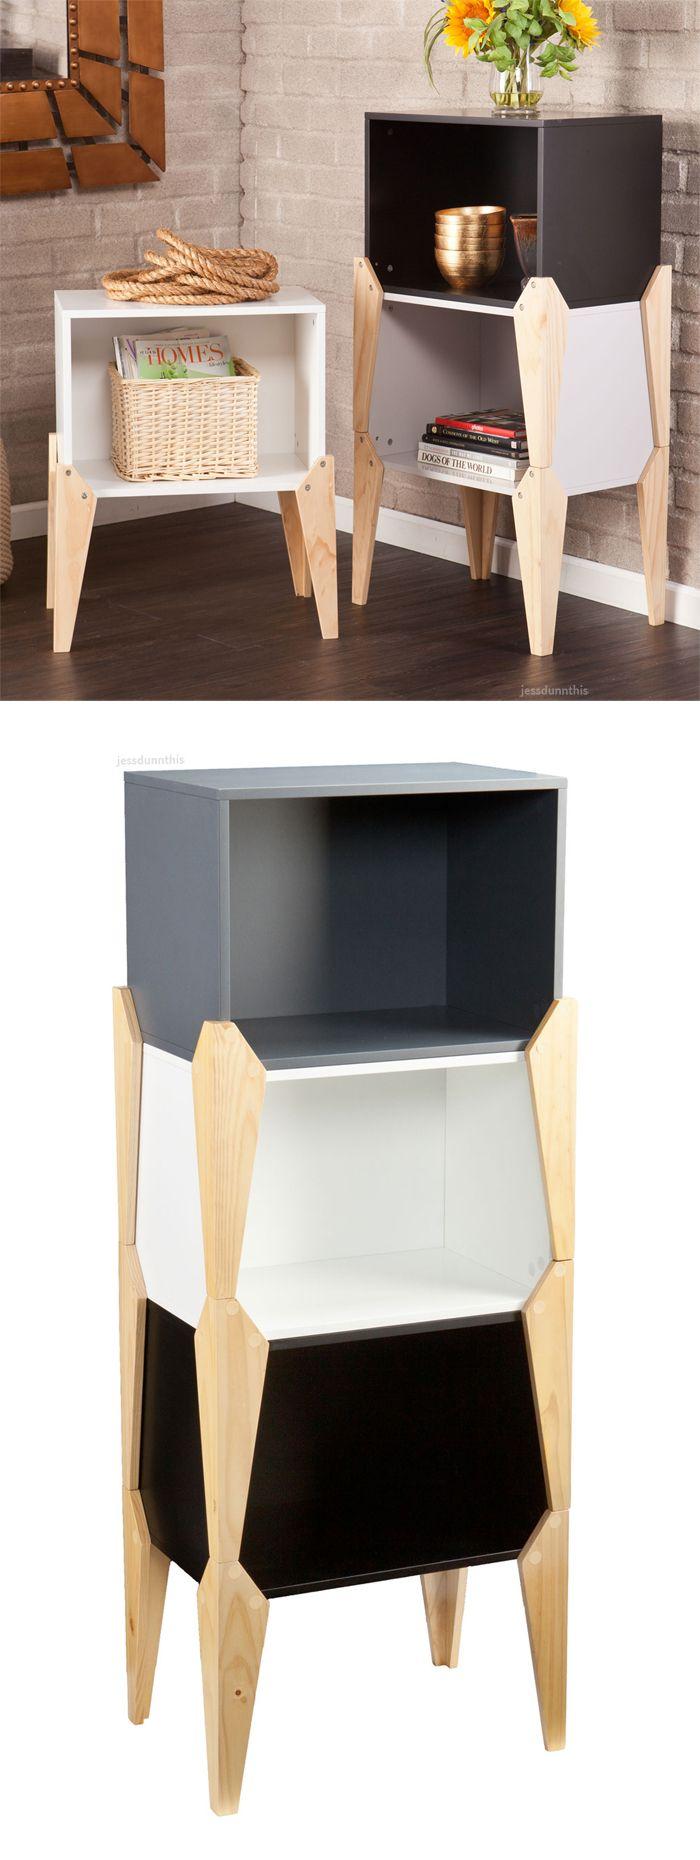 3 Pc Stacking Tables Furniture Interior Furniture Furniture Design